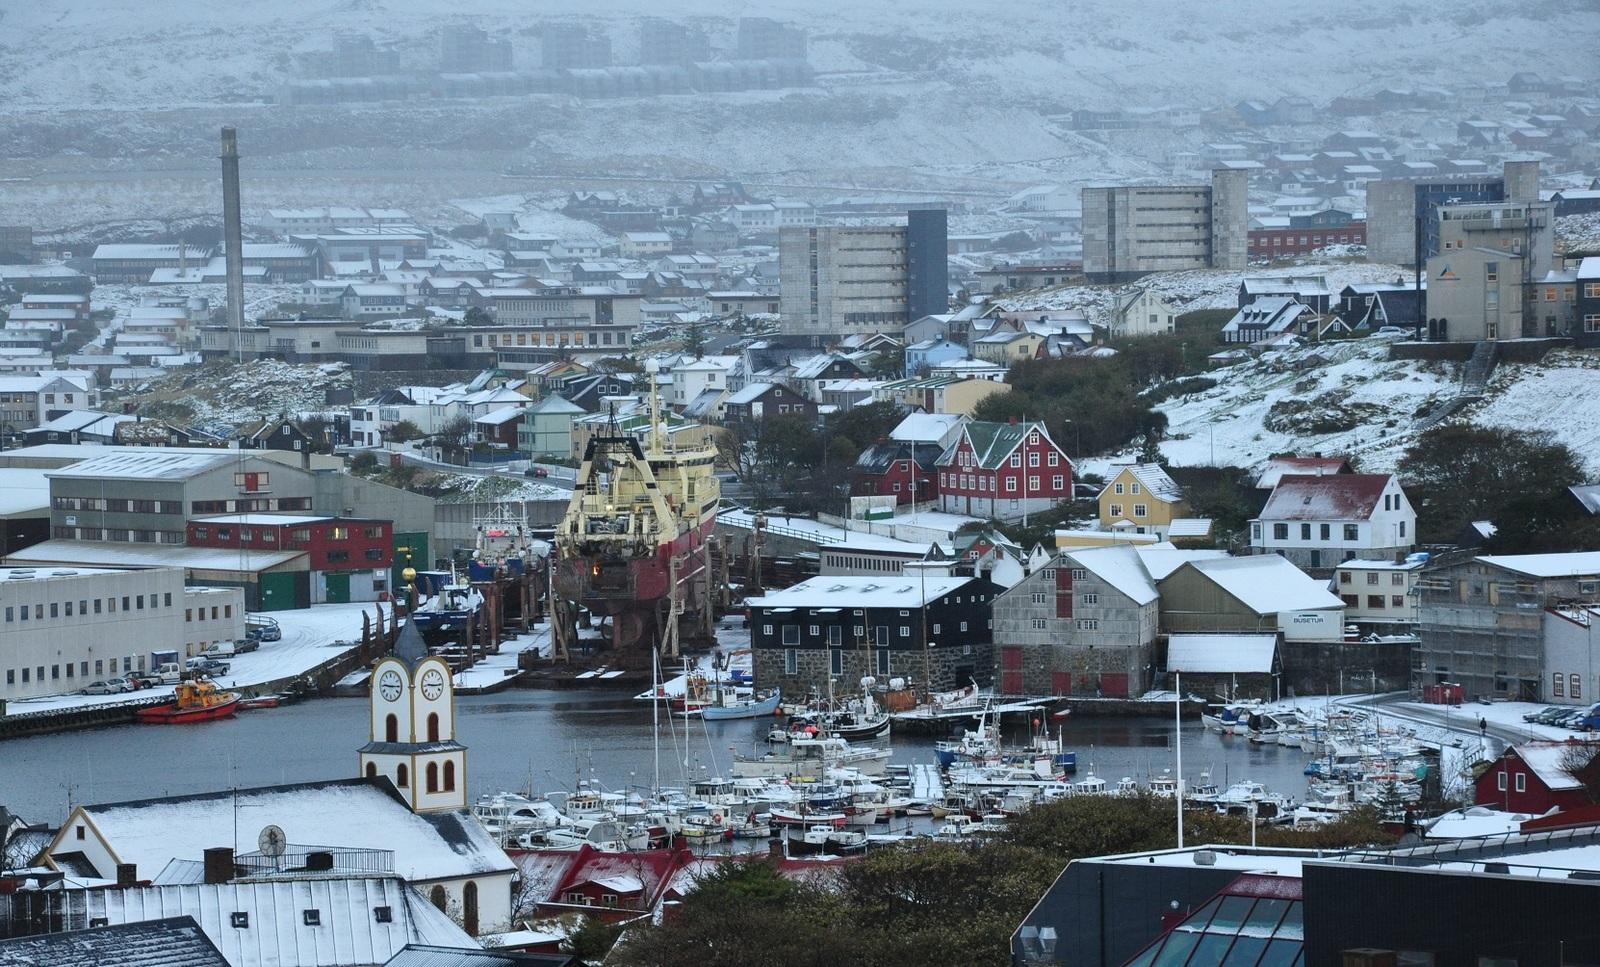 Faroe_Islands,_Streymoy,_T%C3%B3rshavn_(8).jpg